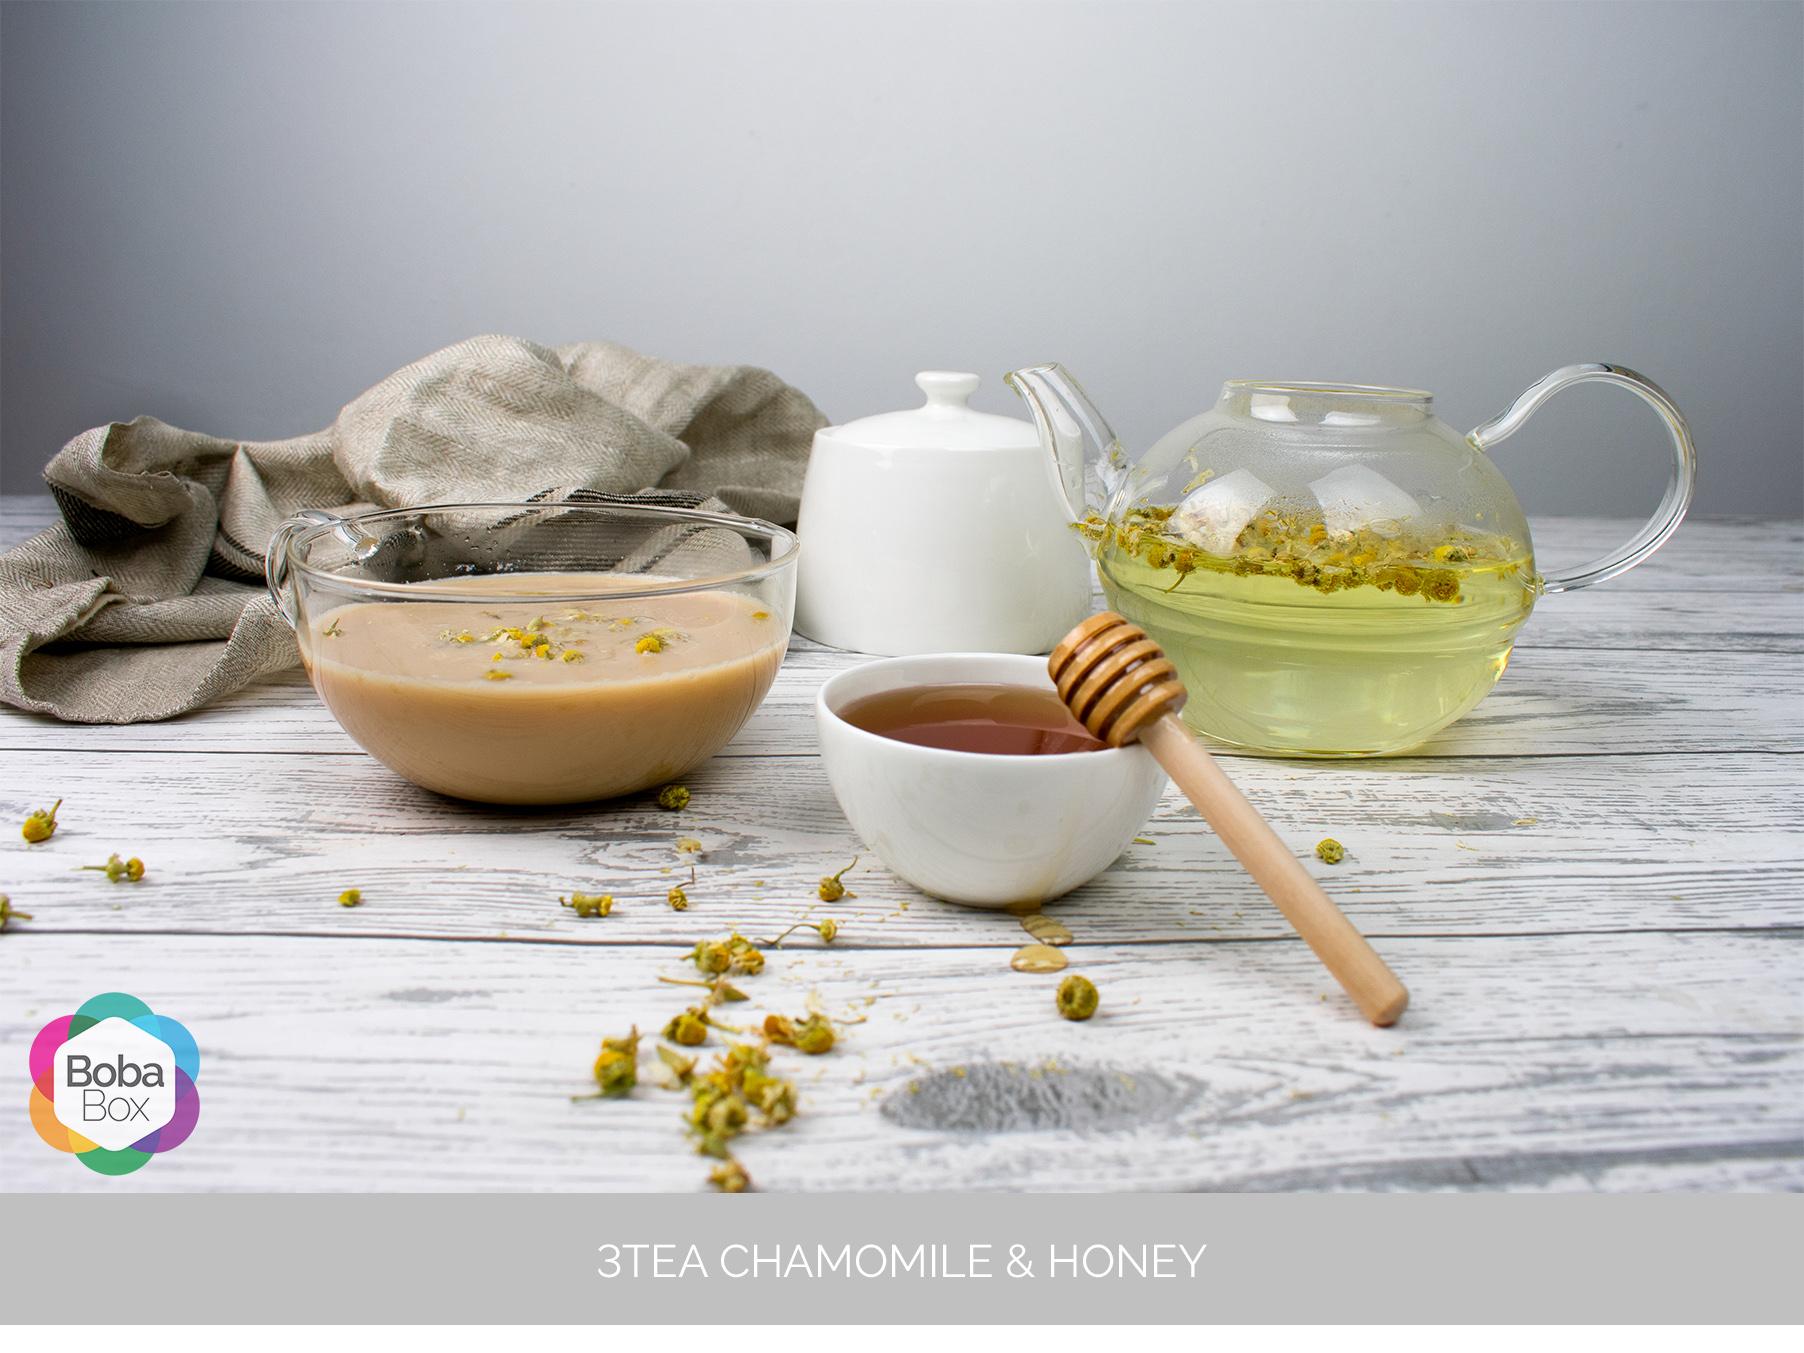 3TEA Chamomile & Honey